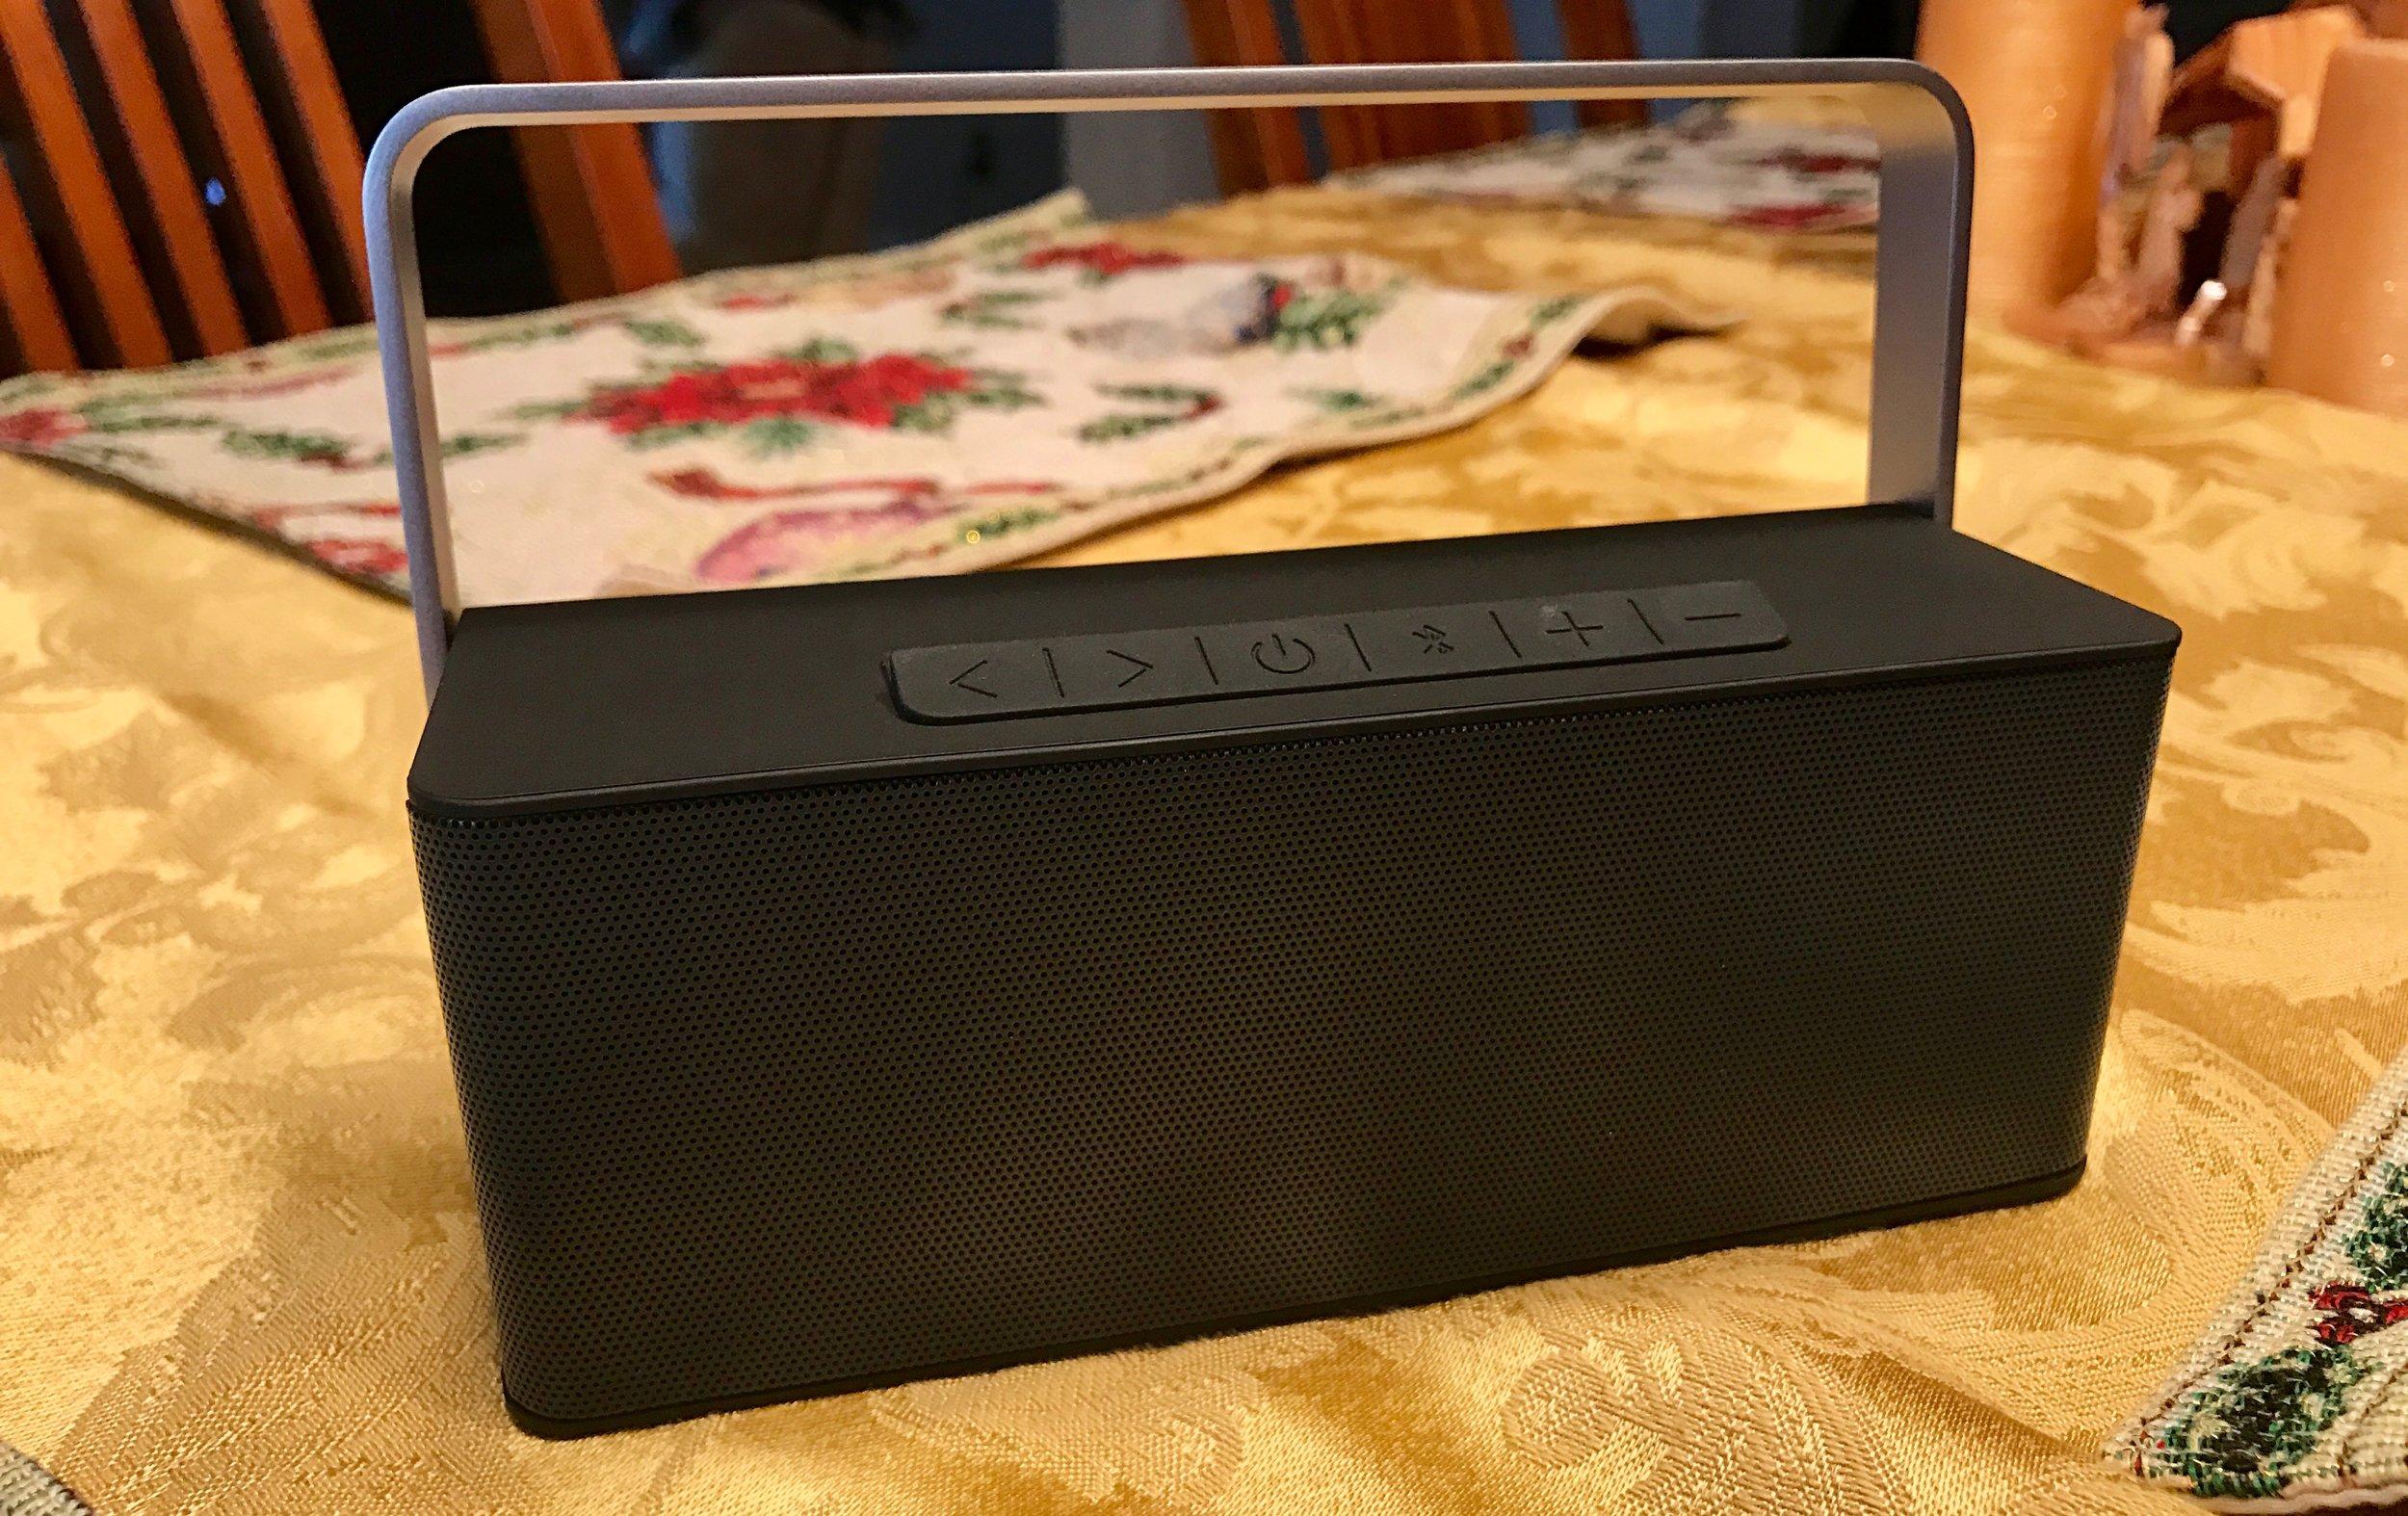 Inateck BP2109 Portable Bluetooth Speaker. Photo ©2016, Steven Sande